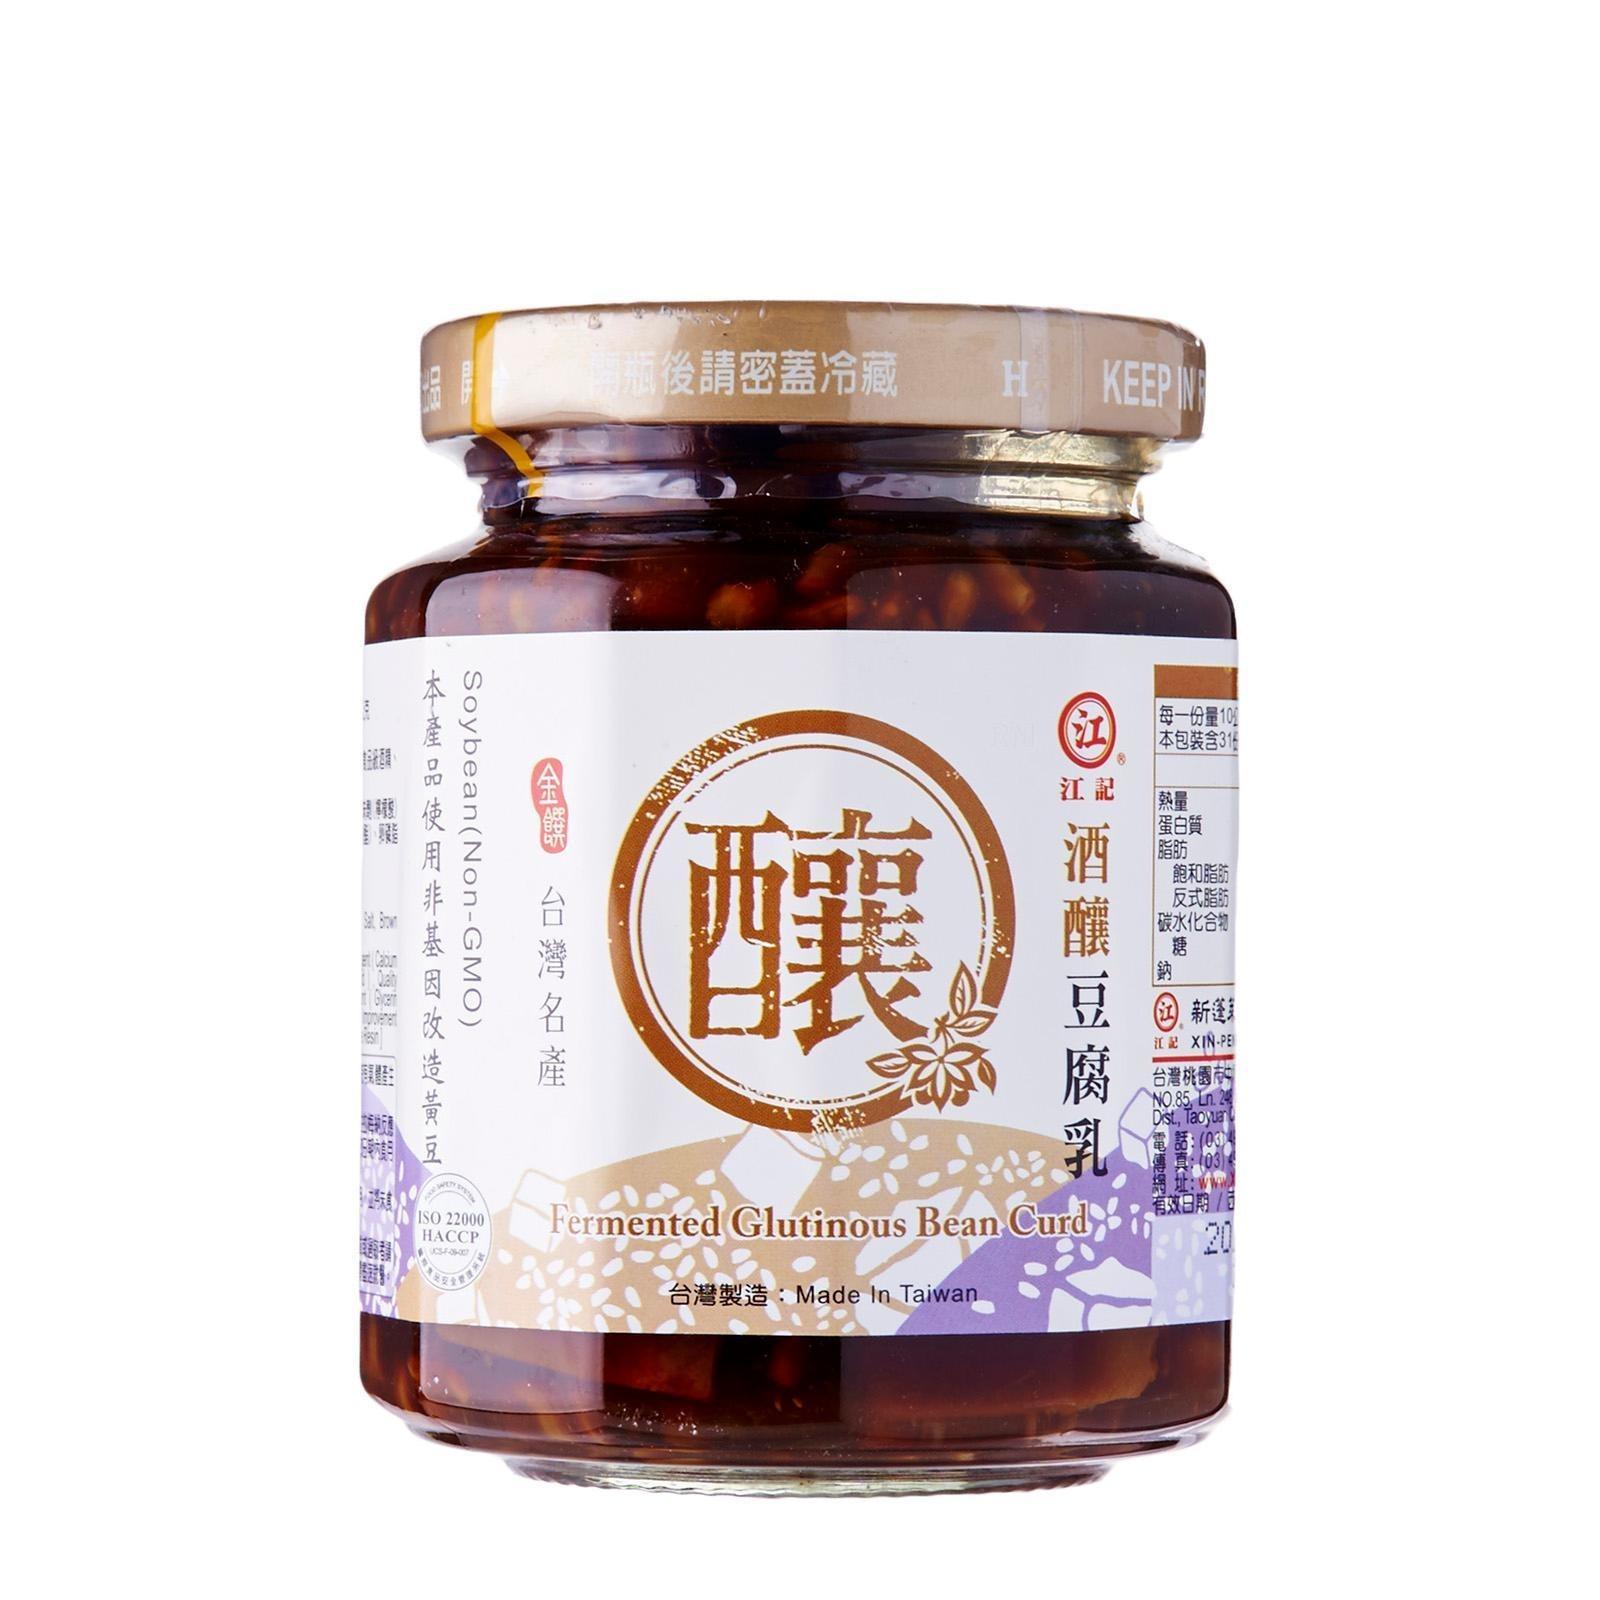 Jiang Ji Fermented Beancurd - Glutinous Rice